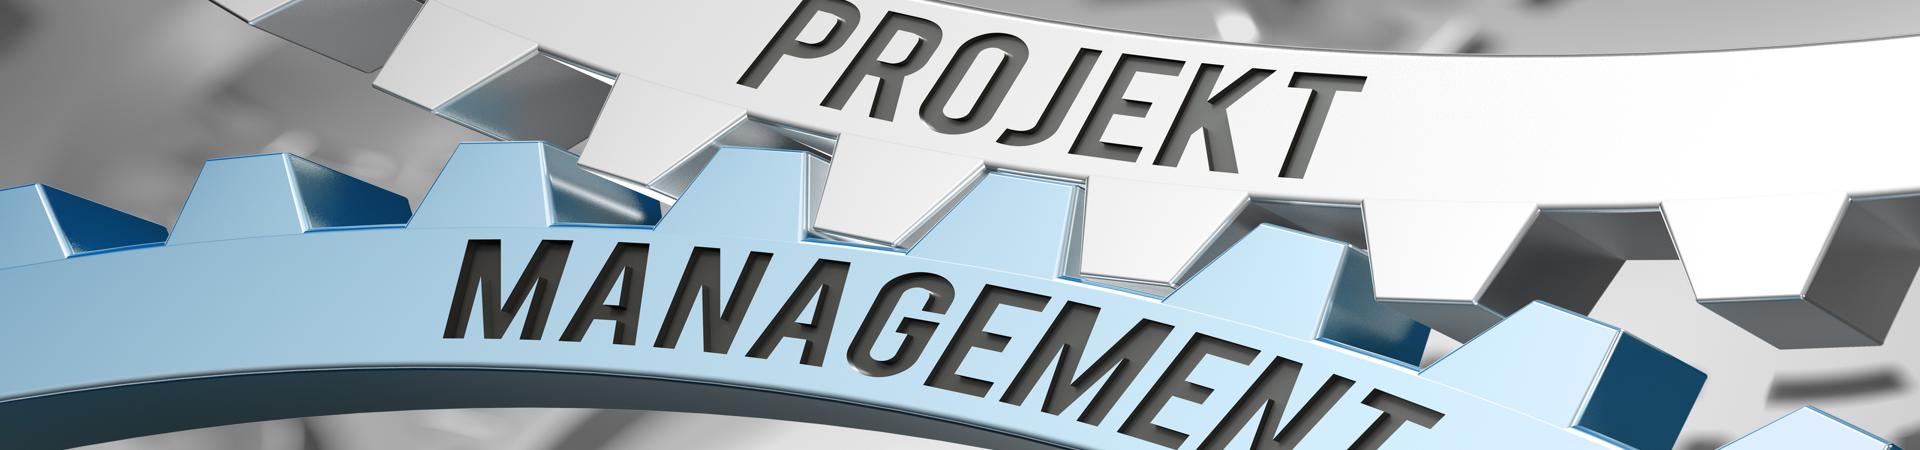 Banner Projektmanagement 1920x450px | SEGNO